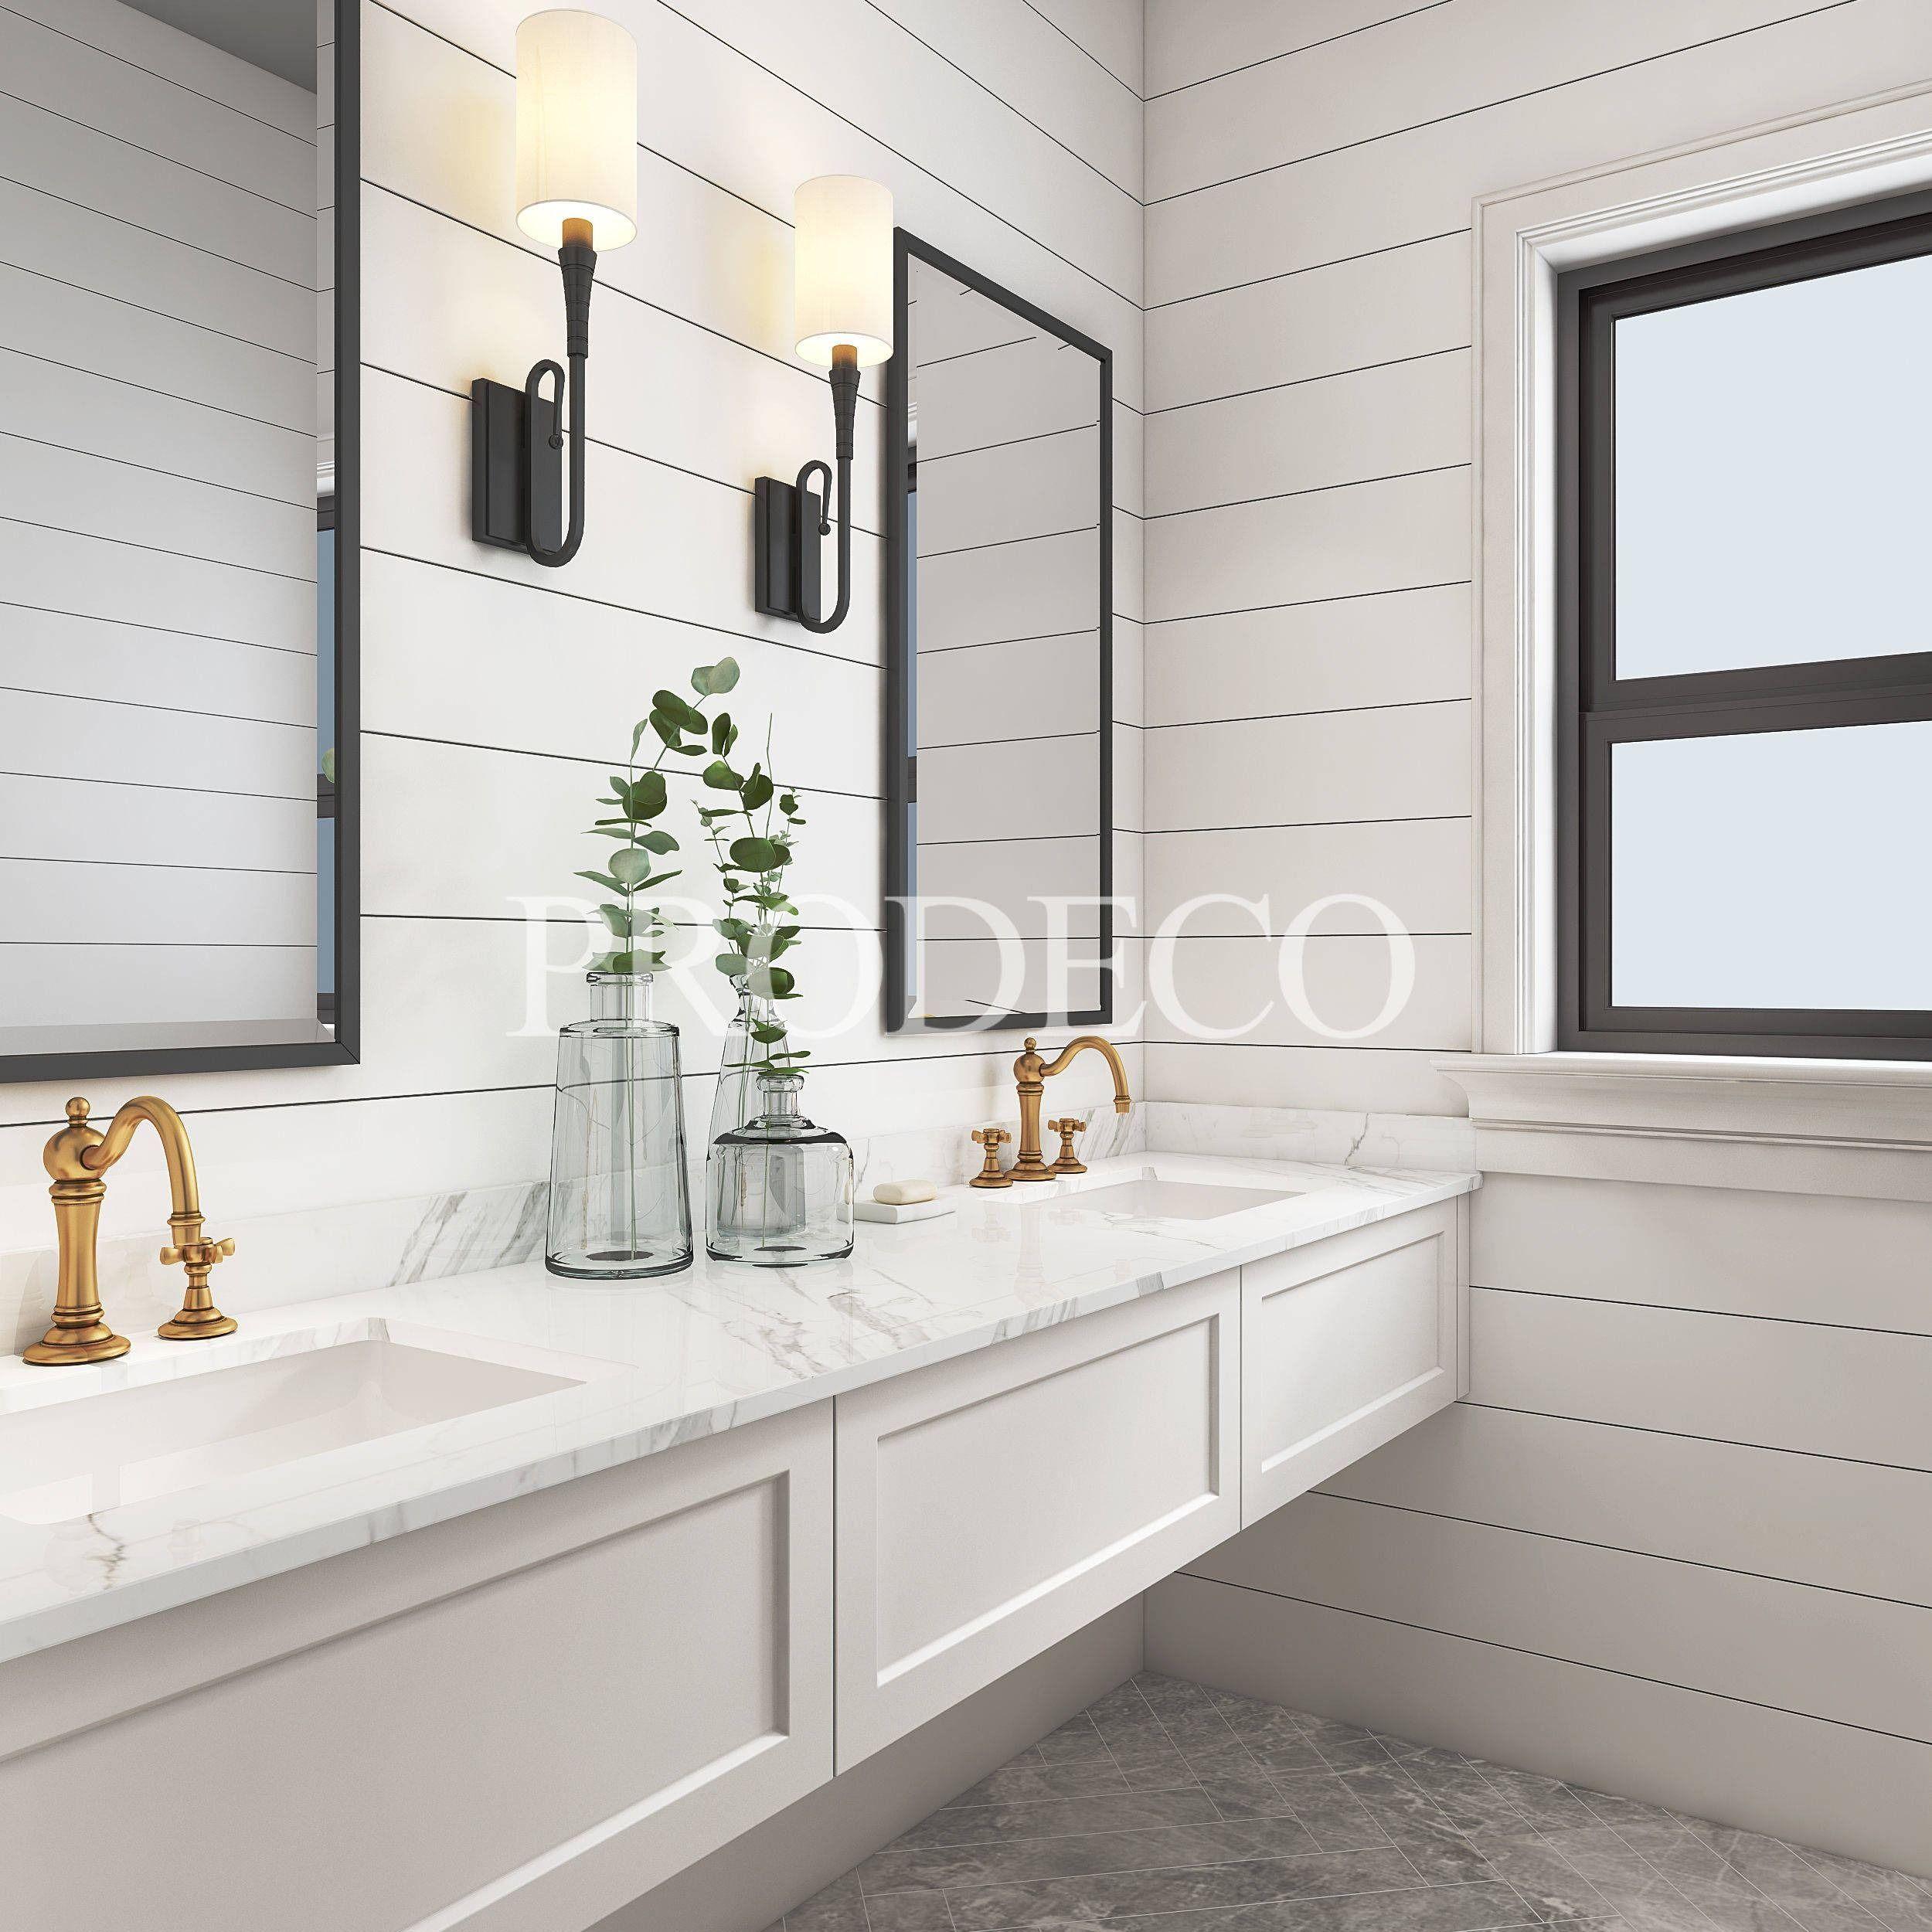 New Modern Design Shaker Style Bathroom Vanity 1000 In 2020 Bathroom Styling Stylish Bathroom Small Narrow Bathroom